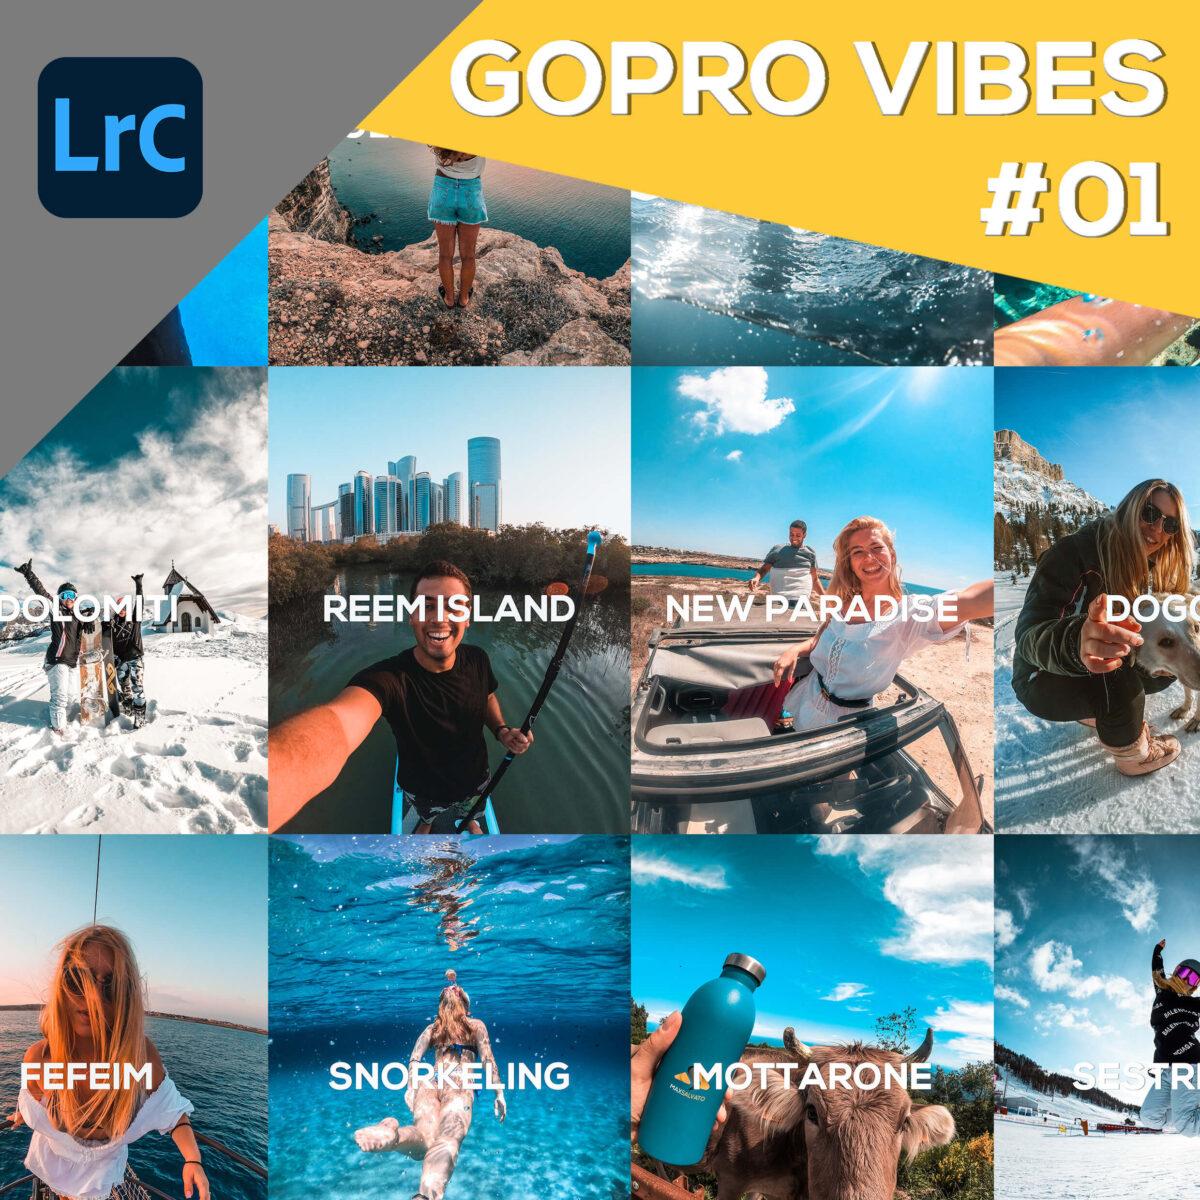 GoPro Vibes #01